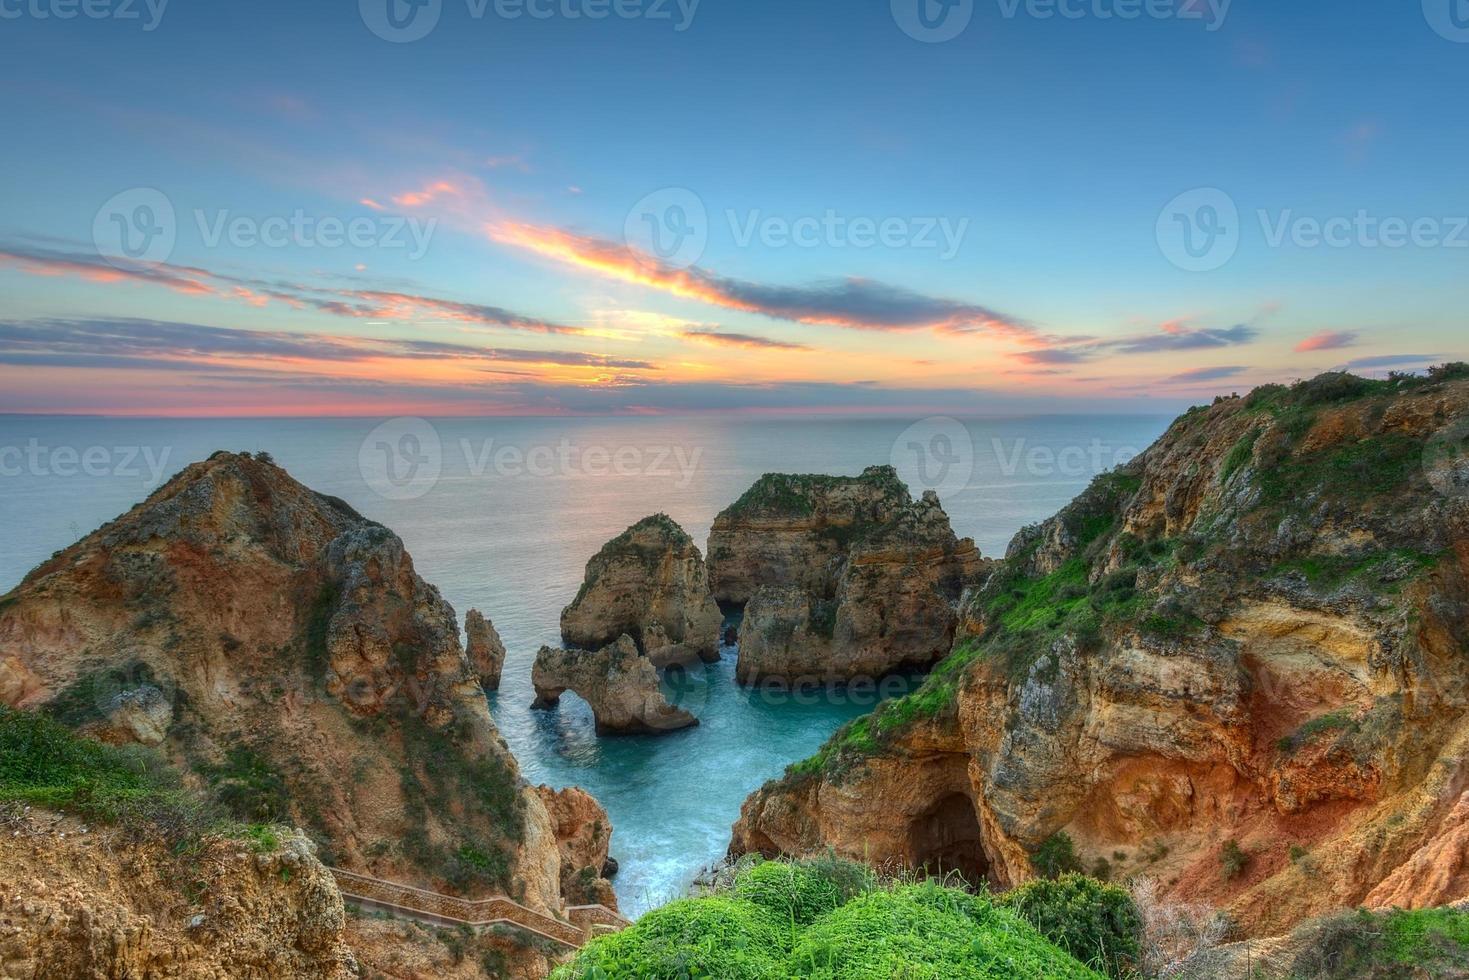 Hermoso mar paisaje amanecer. Lagos, Portugal, Algarve. foto